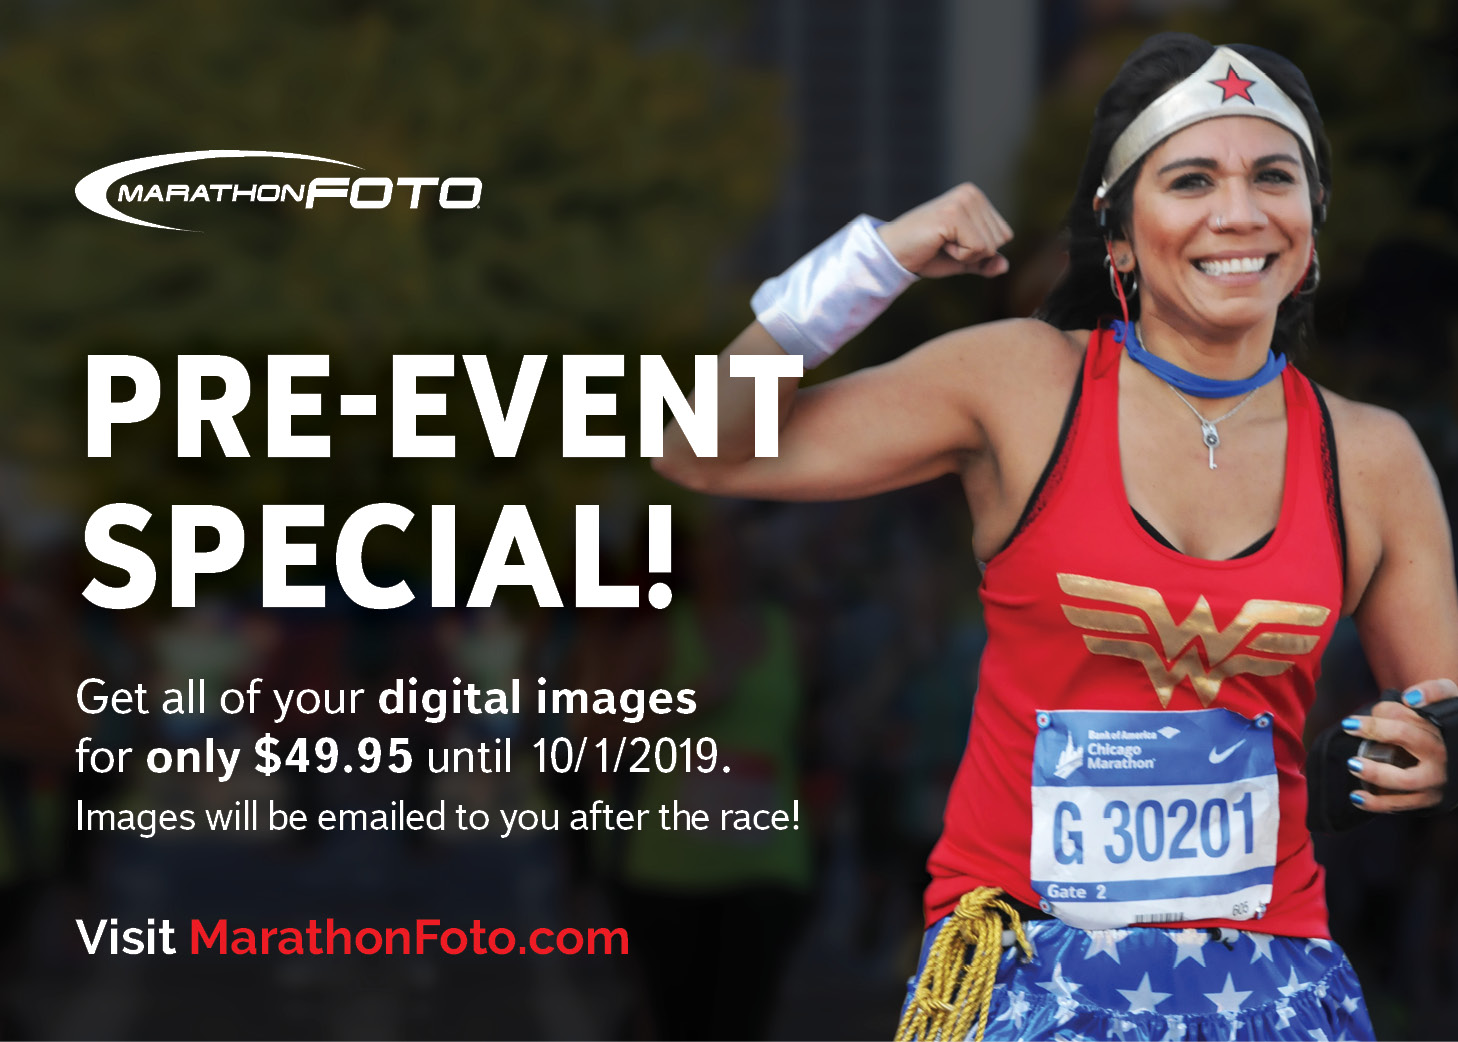 MarathonFoto - Pre-Event Special!